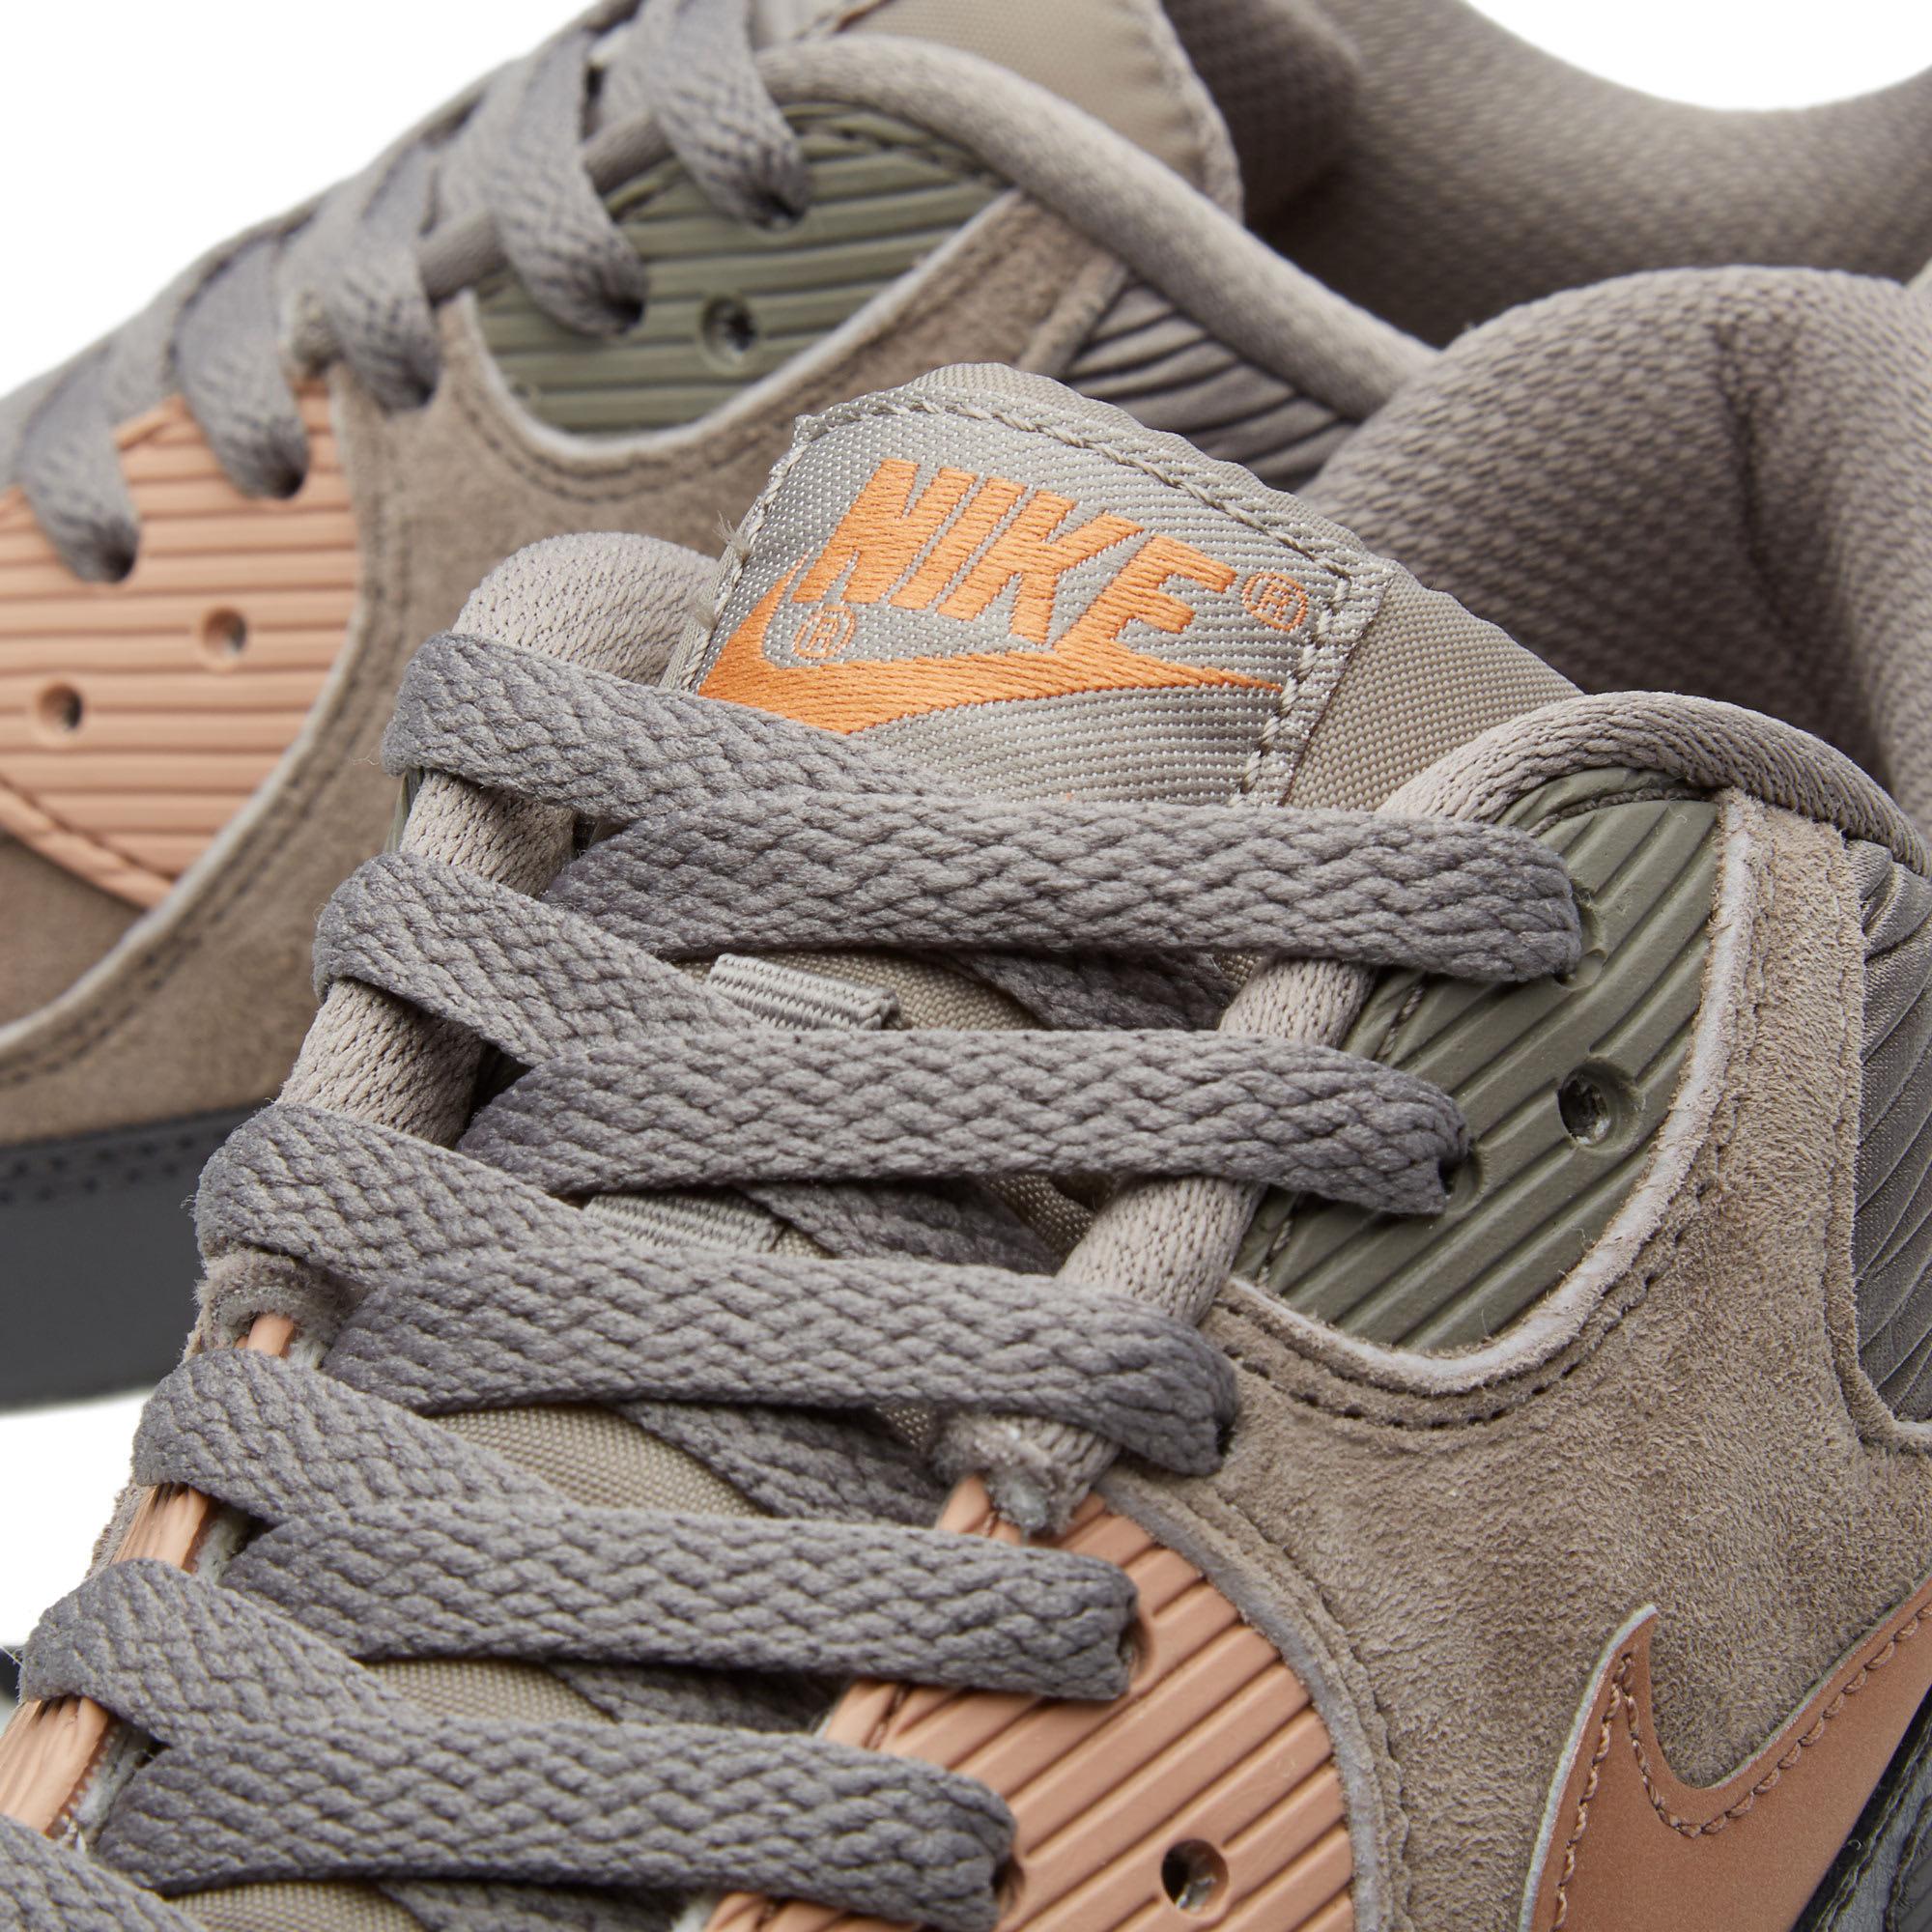 Nike Air Max 90 (w) Iron Metallic Red Bronze Leather